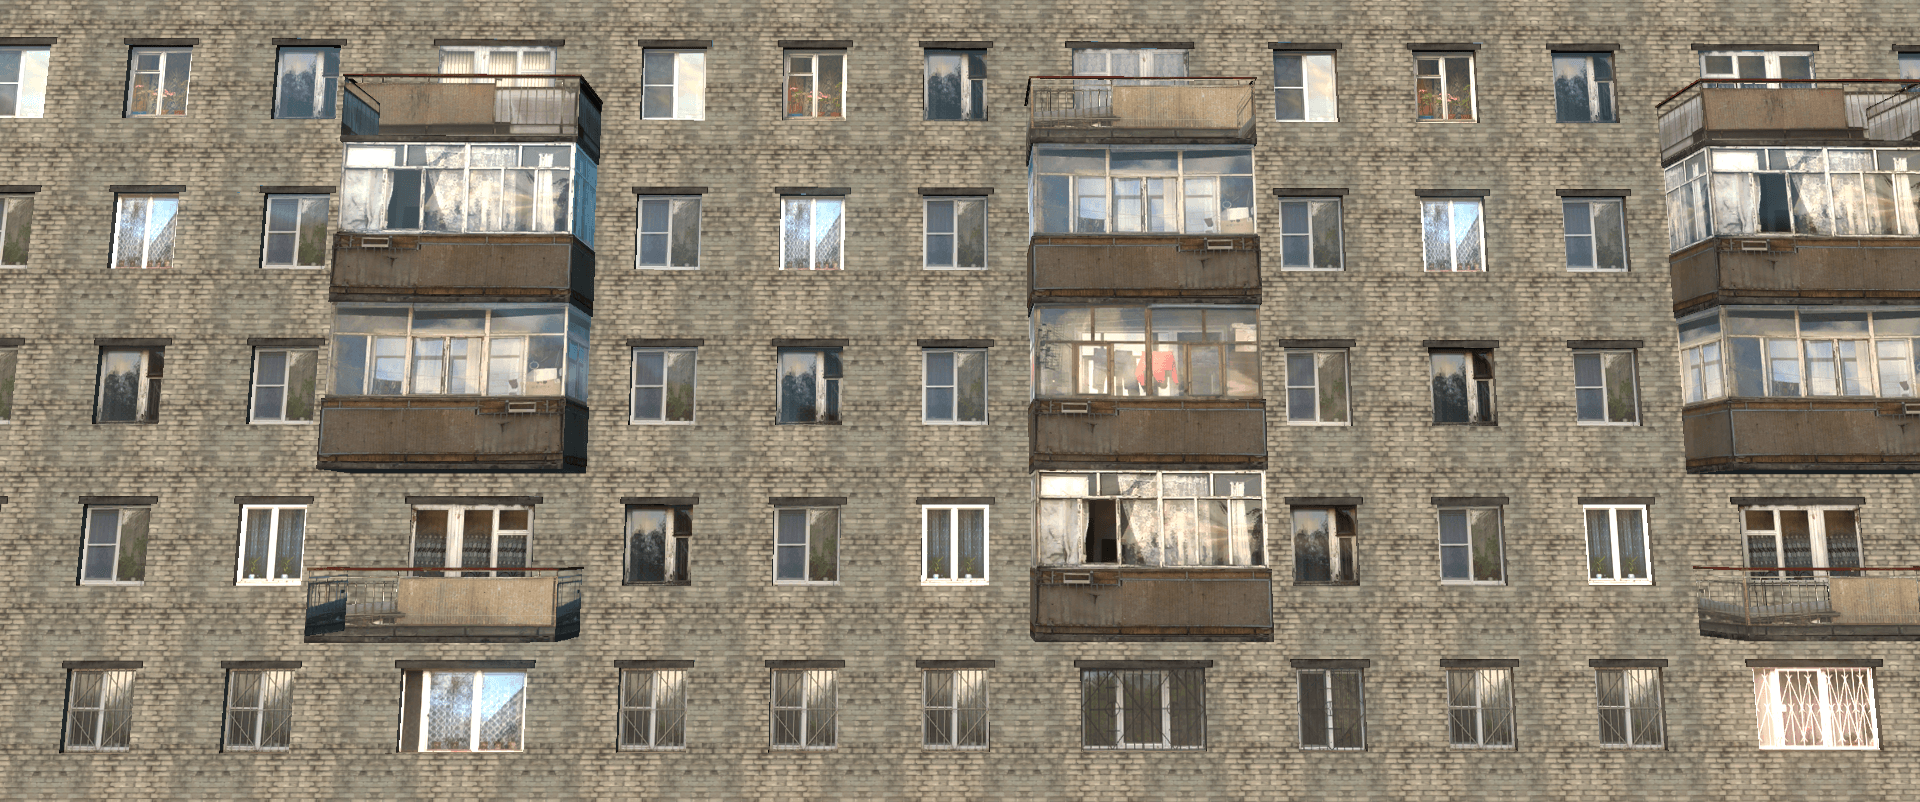 цены на окна 5-ти этажка (кирпич)